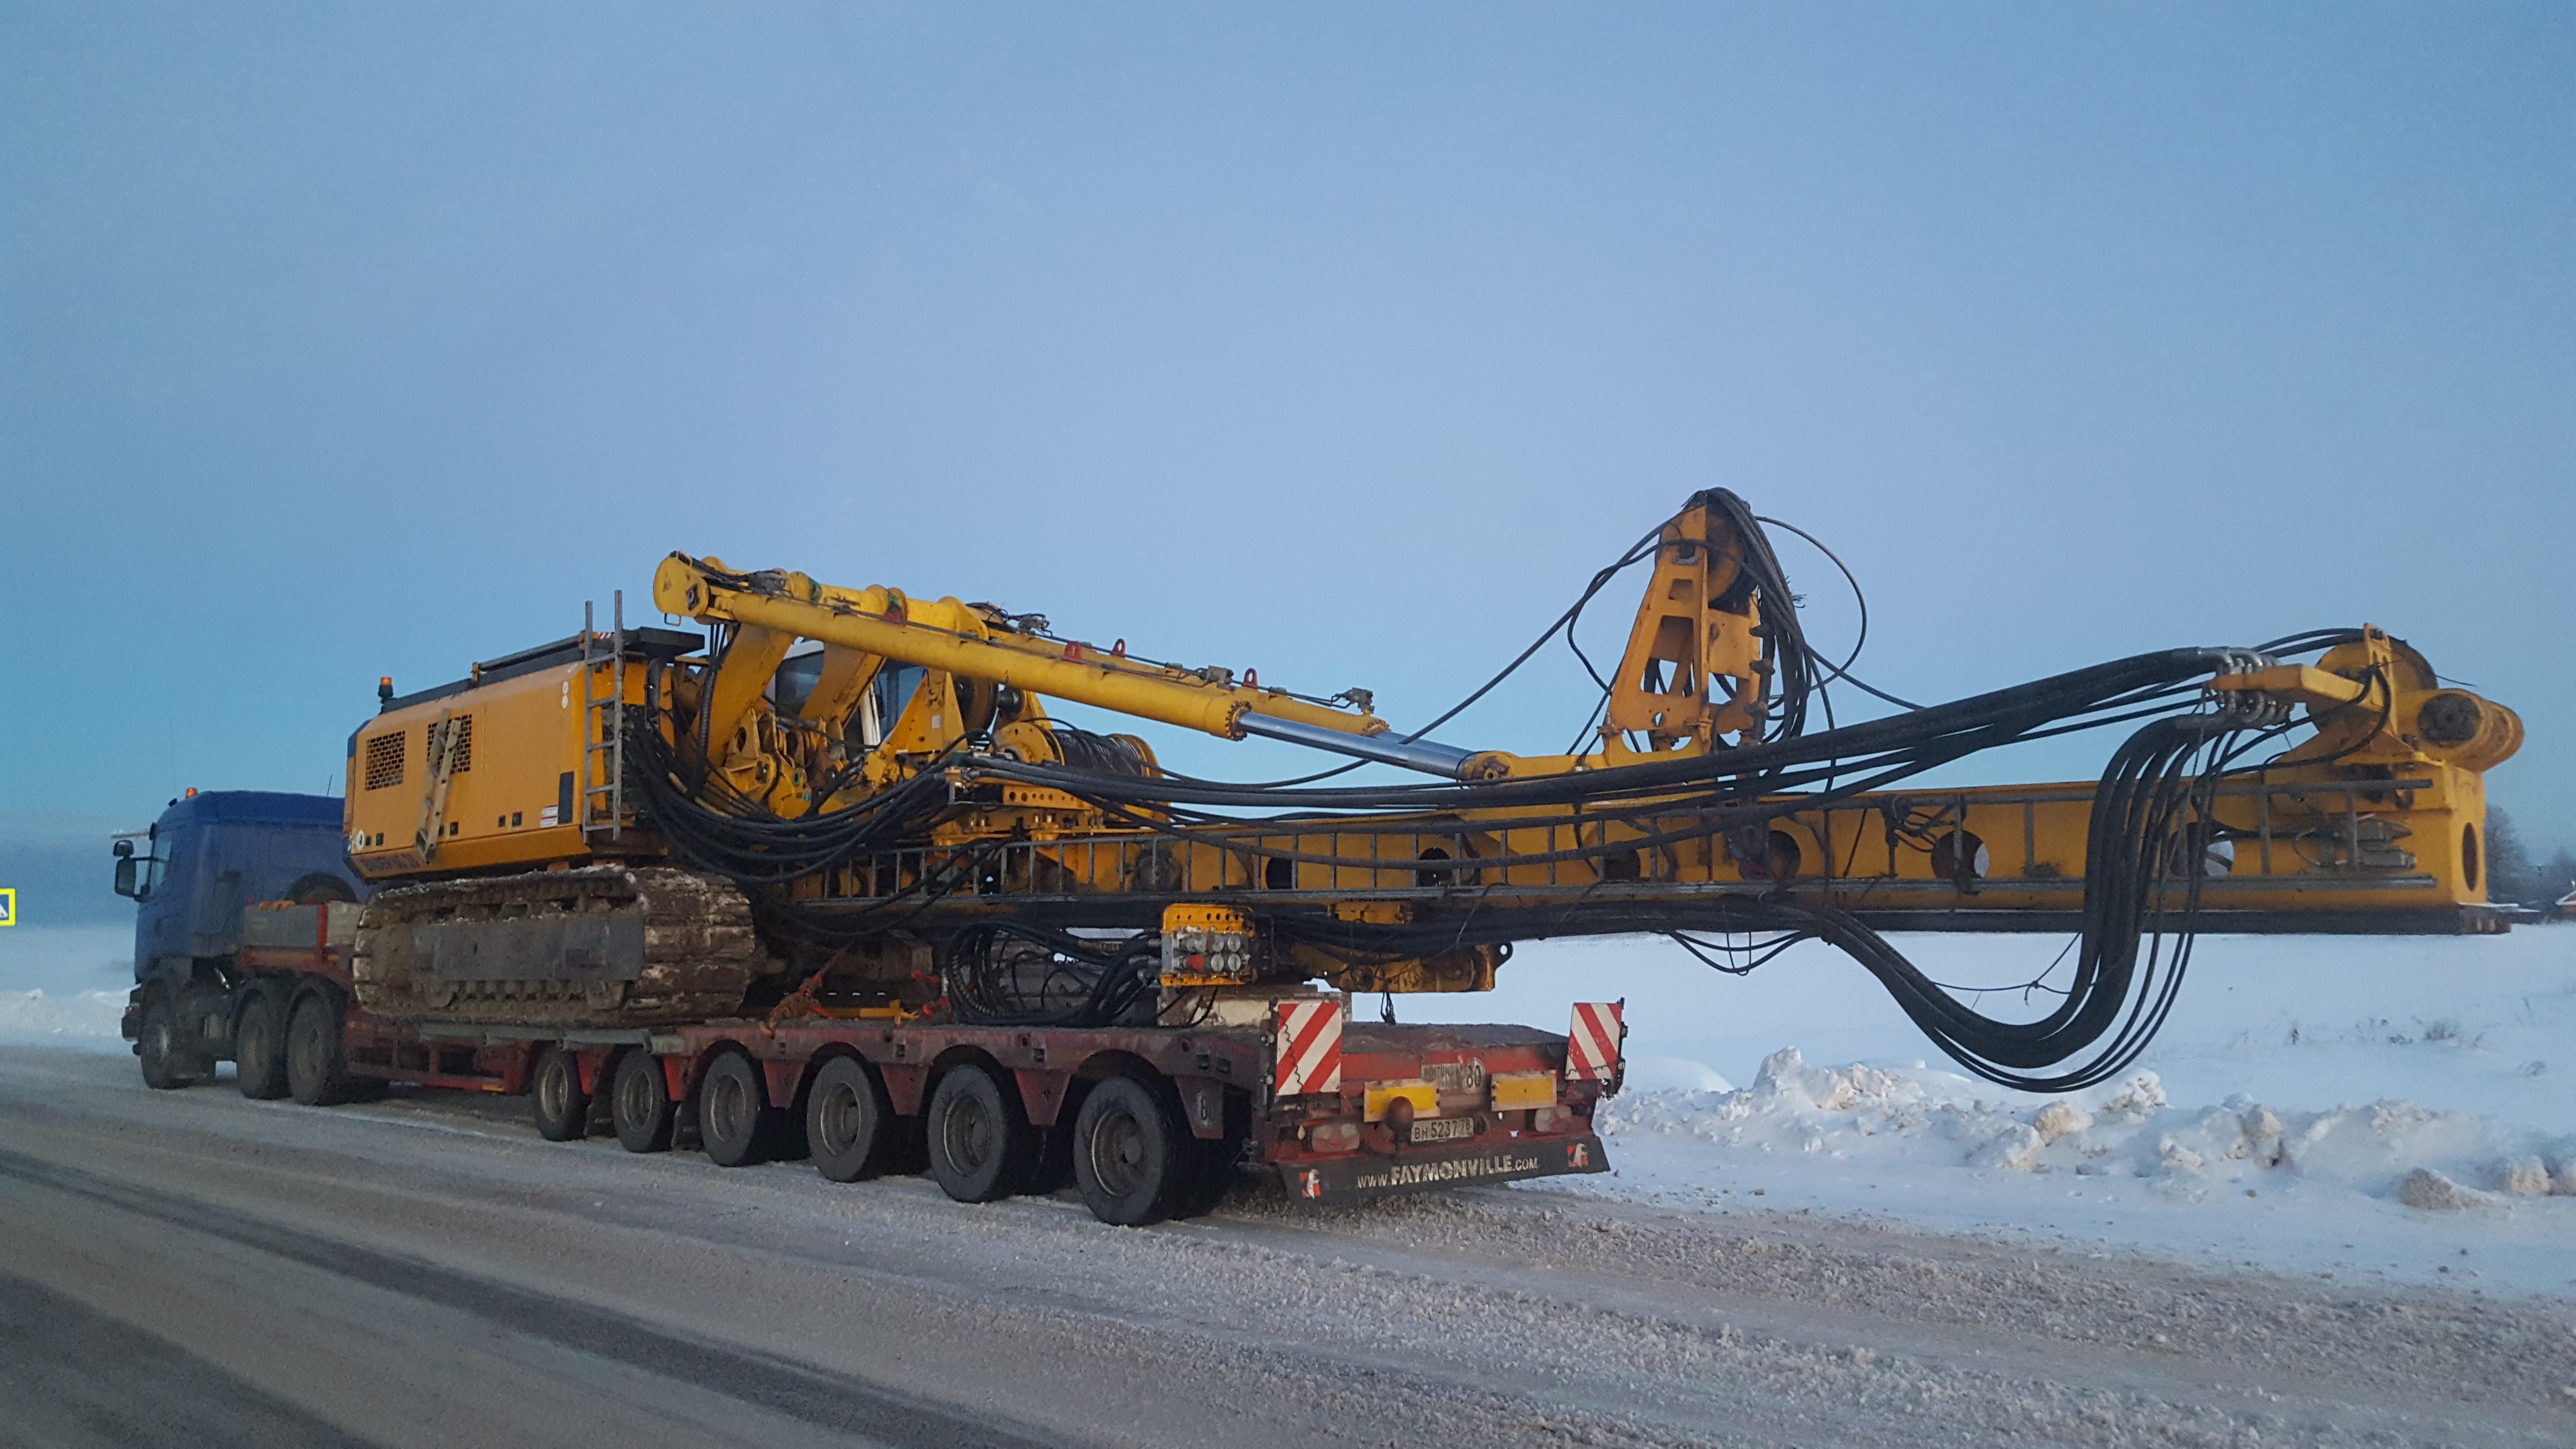 Перевозка промышленной техники весом 80 тонн в зимних условиях